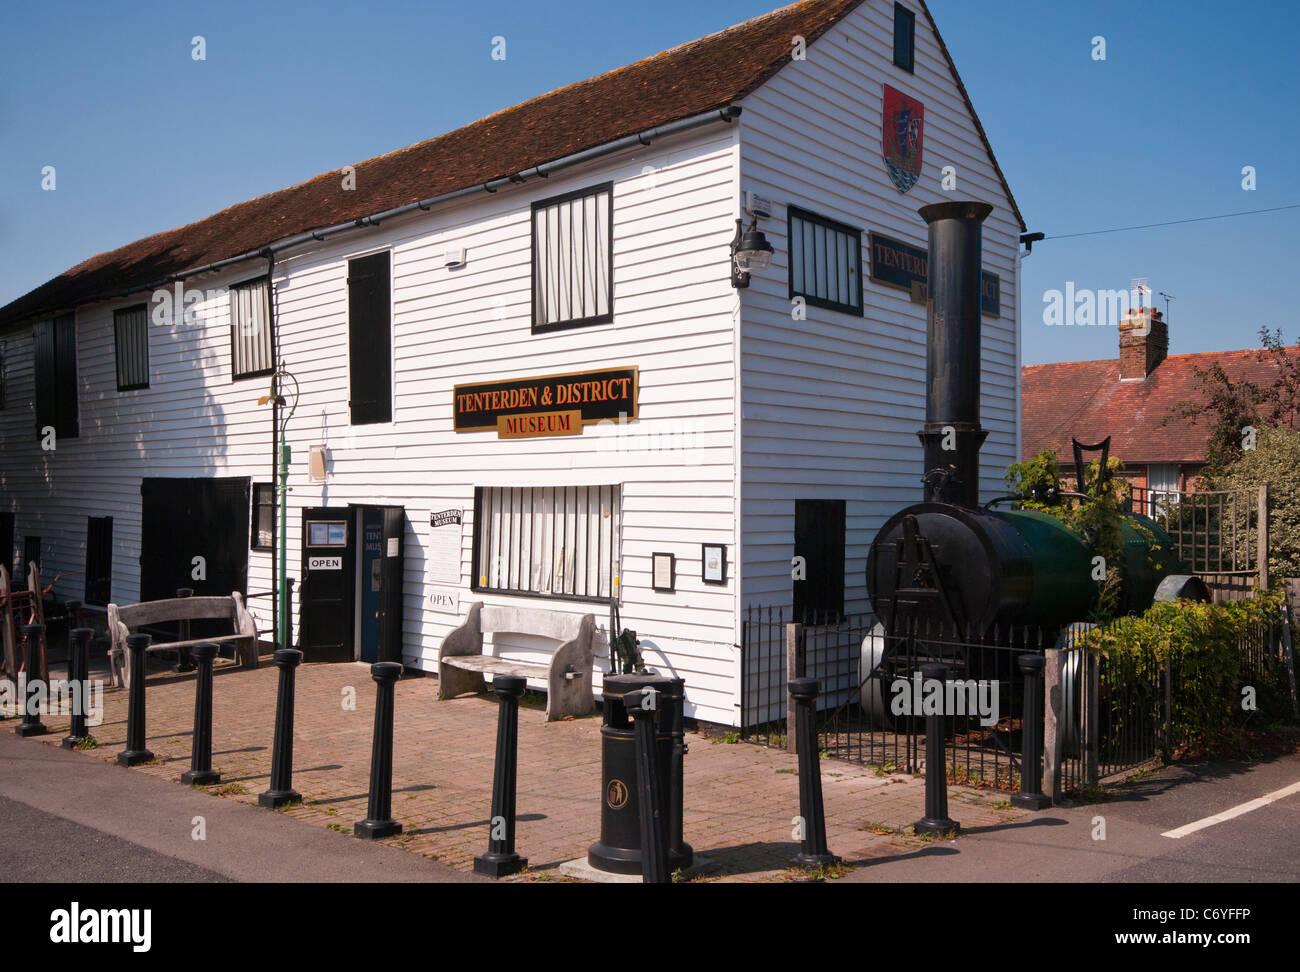 Tenterden and District Museum Kent England - Stock Image